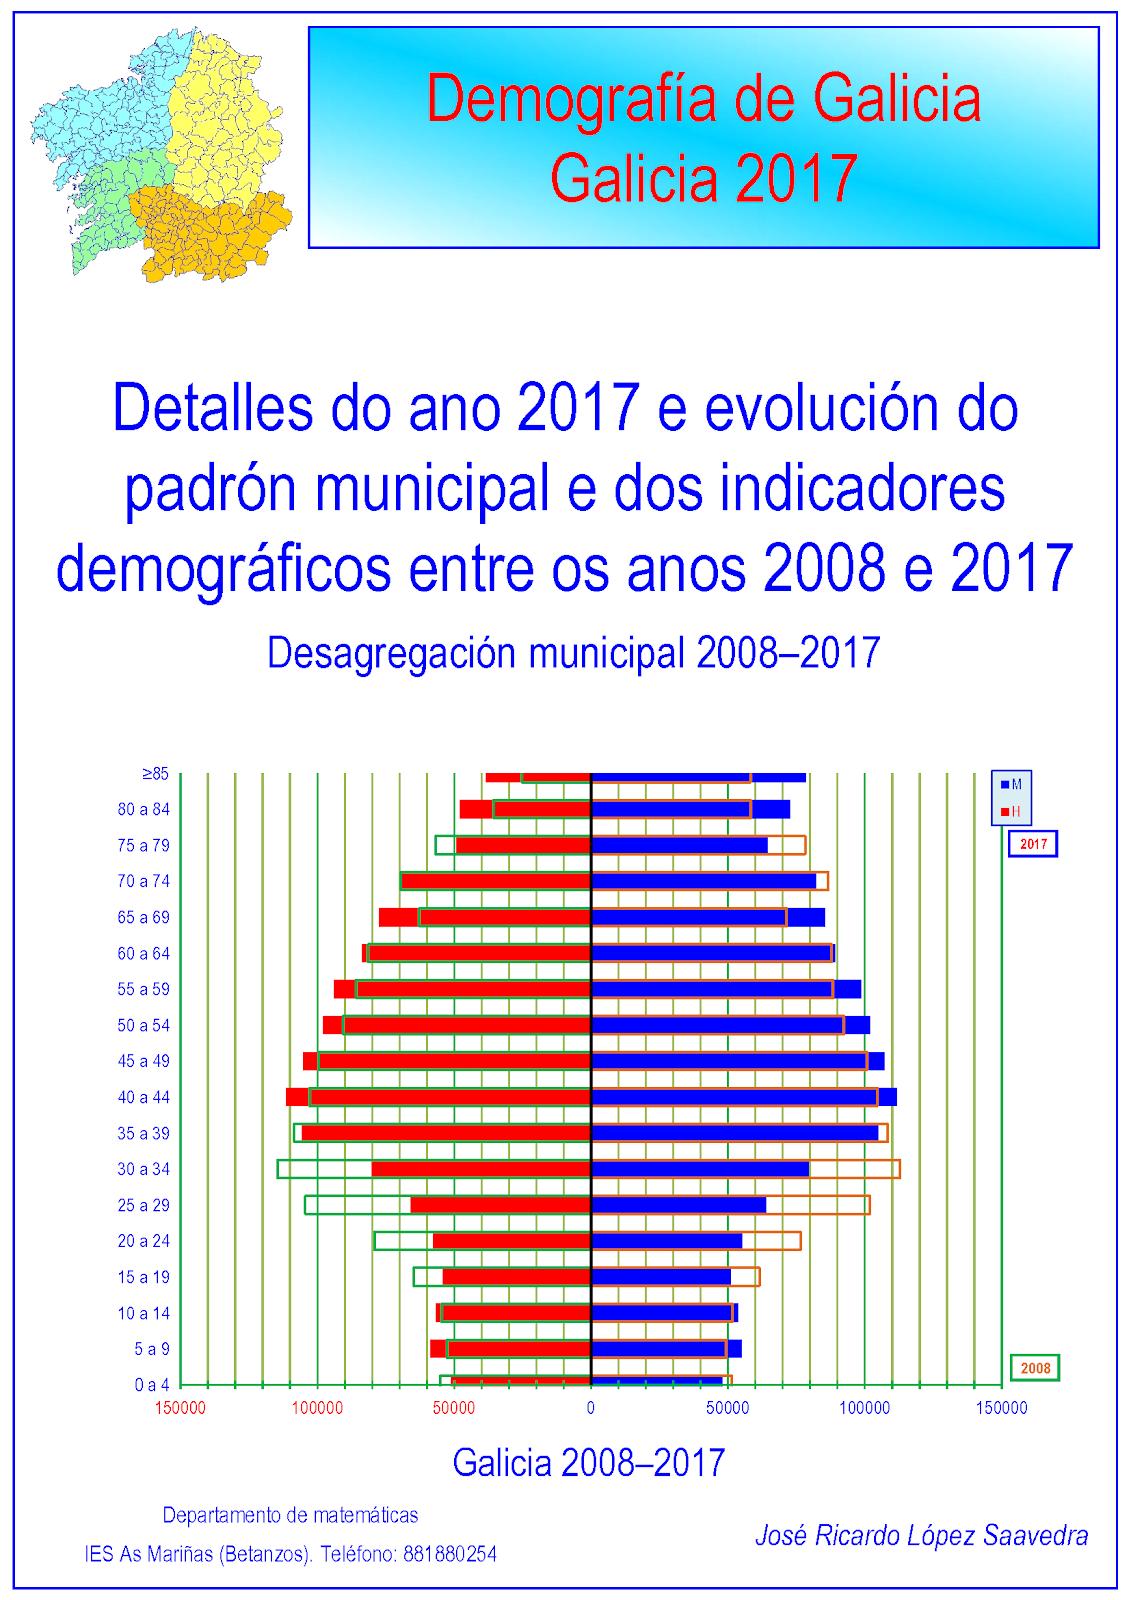 Galicia 2017